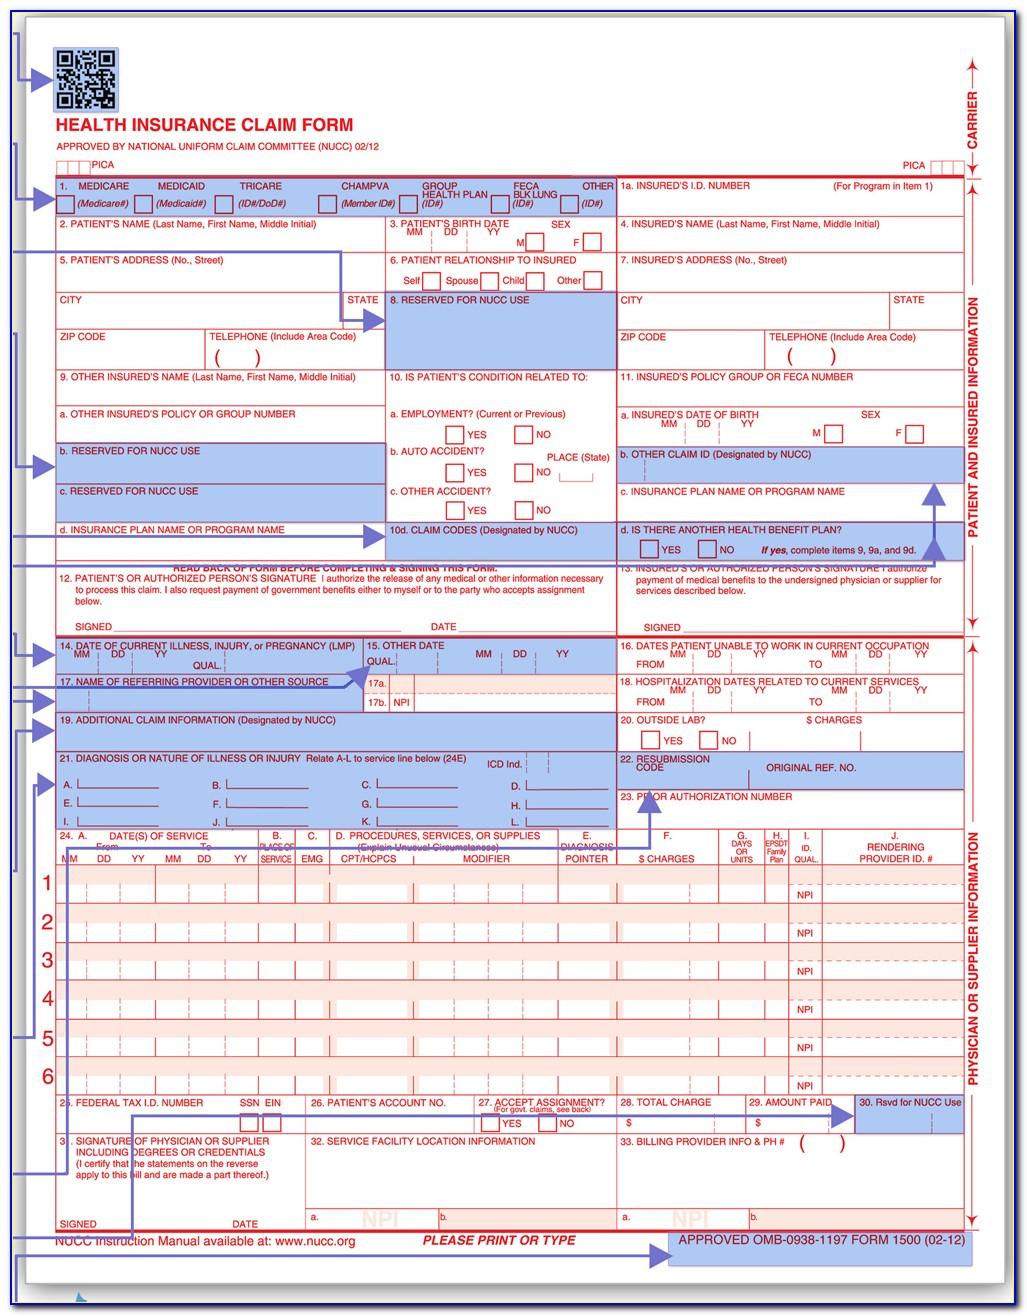 Hcfa 1500 Pdf Form